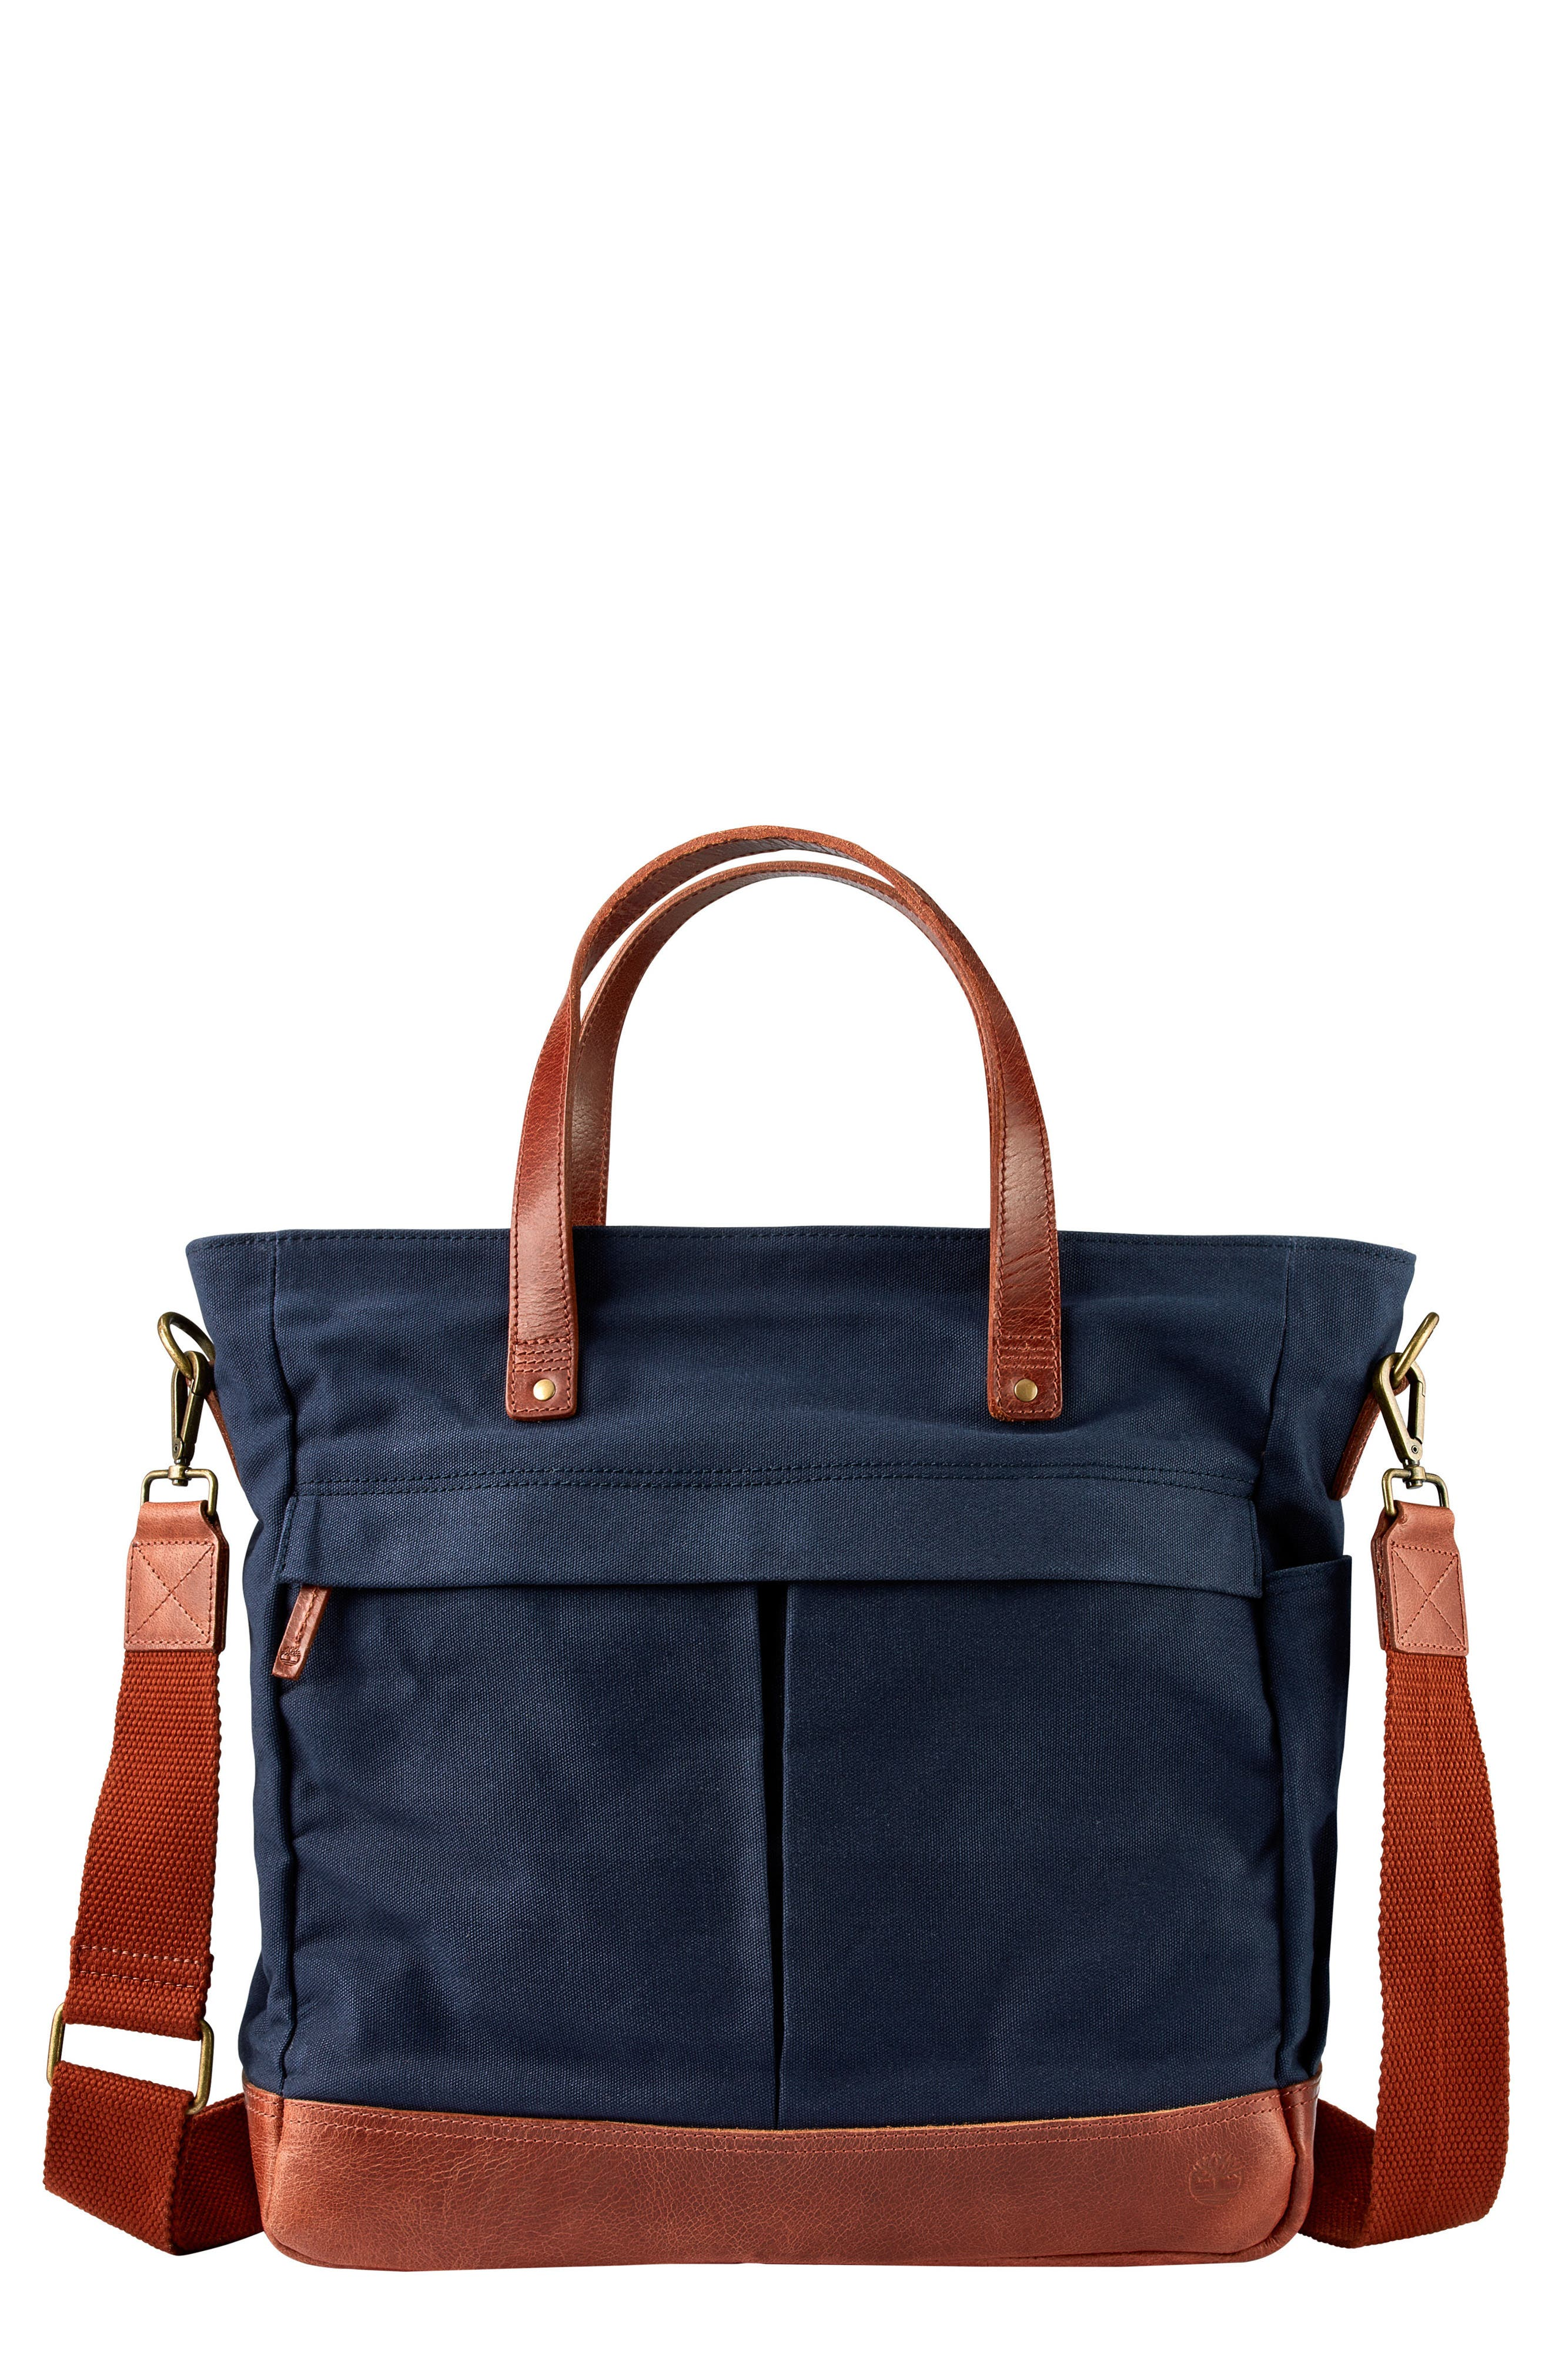 Nantasket Tote Bag,                         Main,                         color, 435